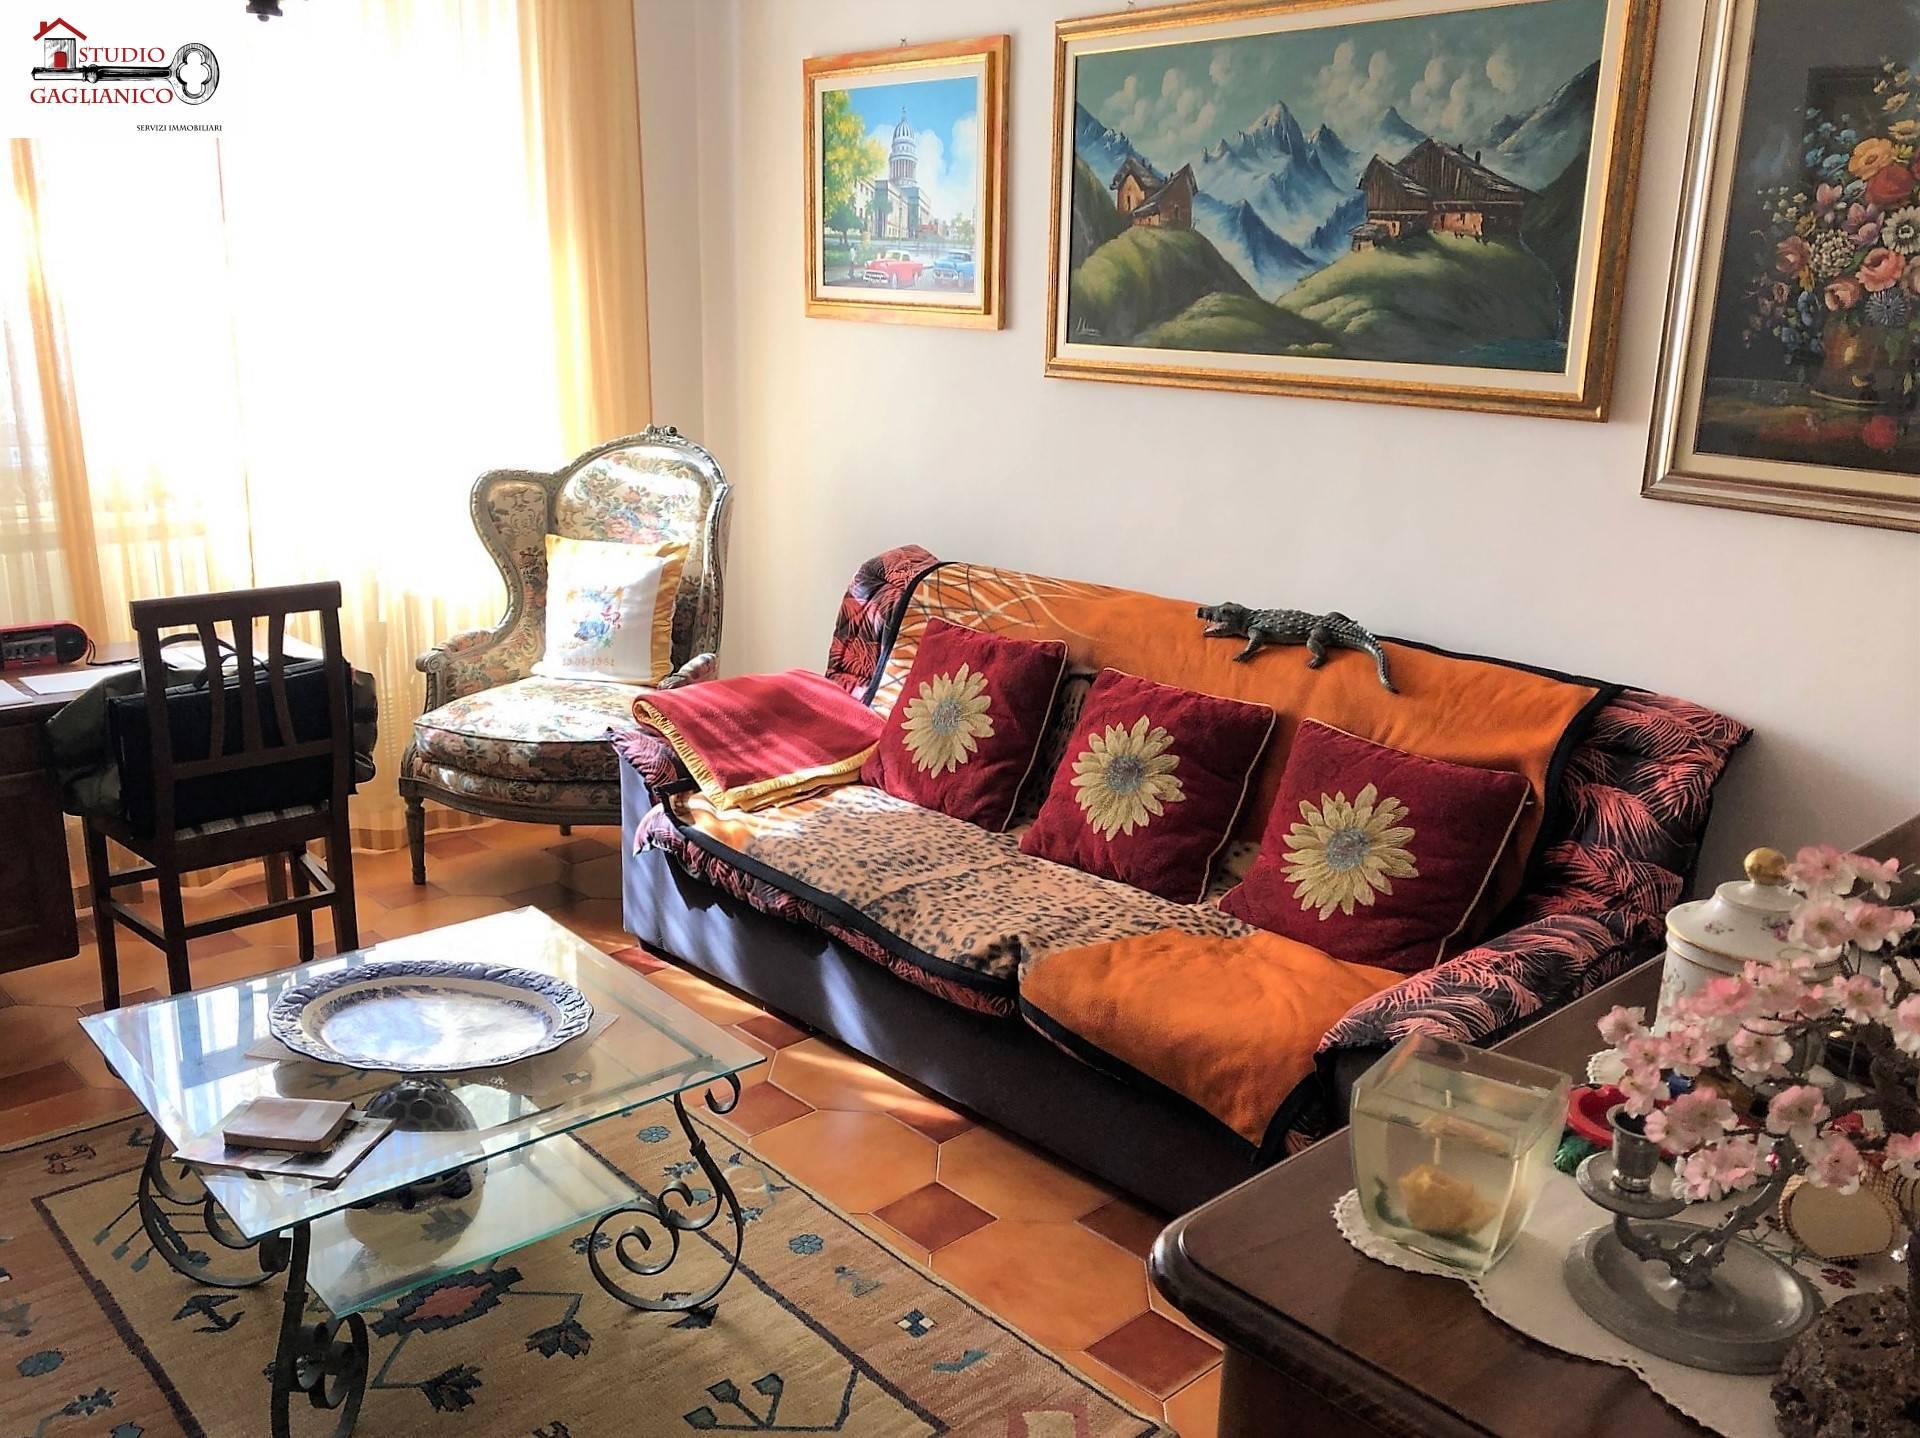 Appartamento in vendita a Gaglianico (BI)